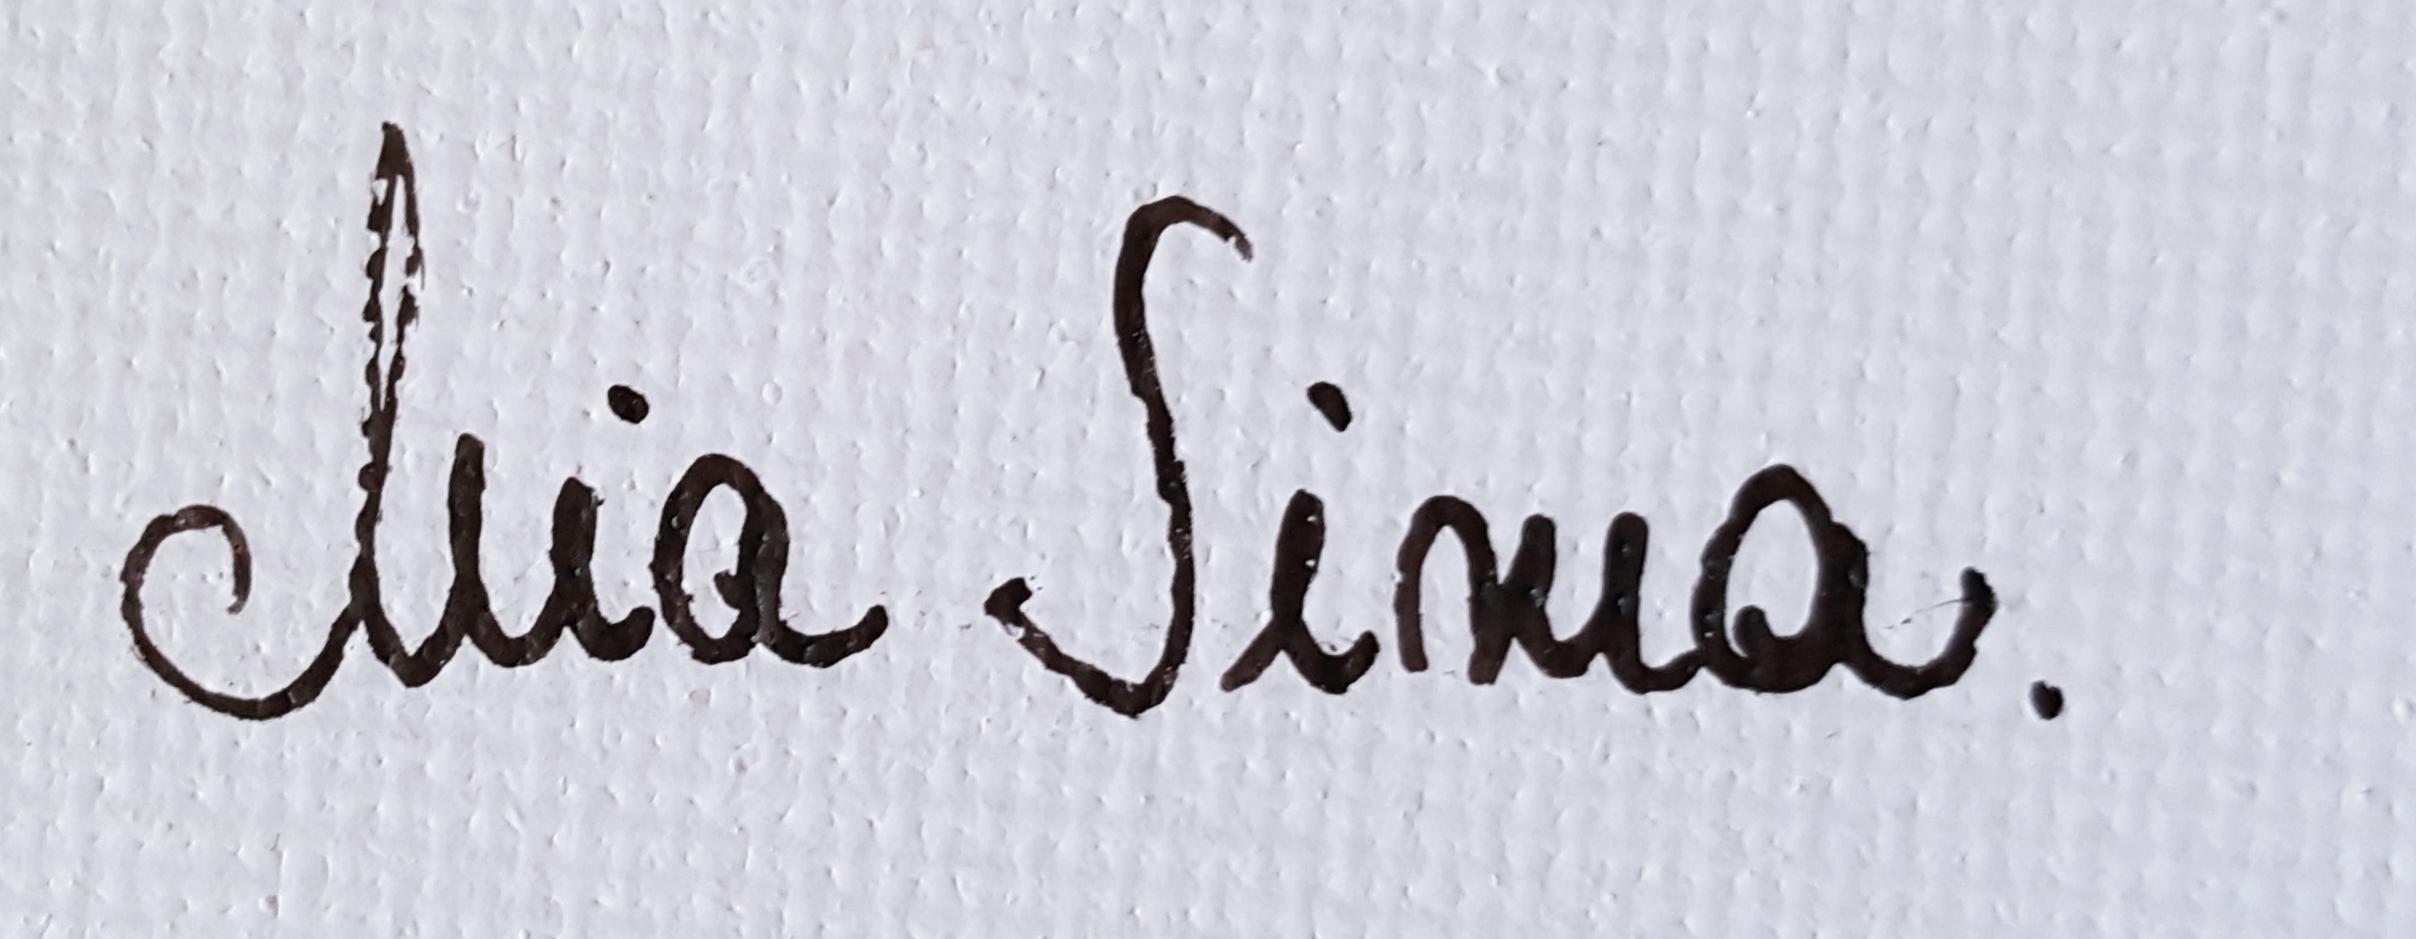 MiA Sima's Signature